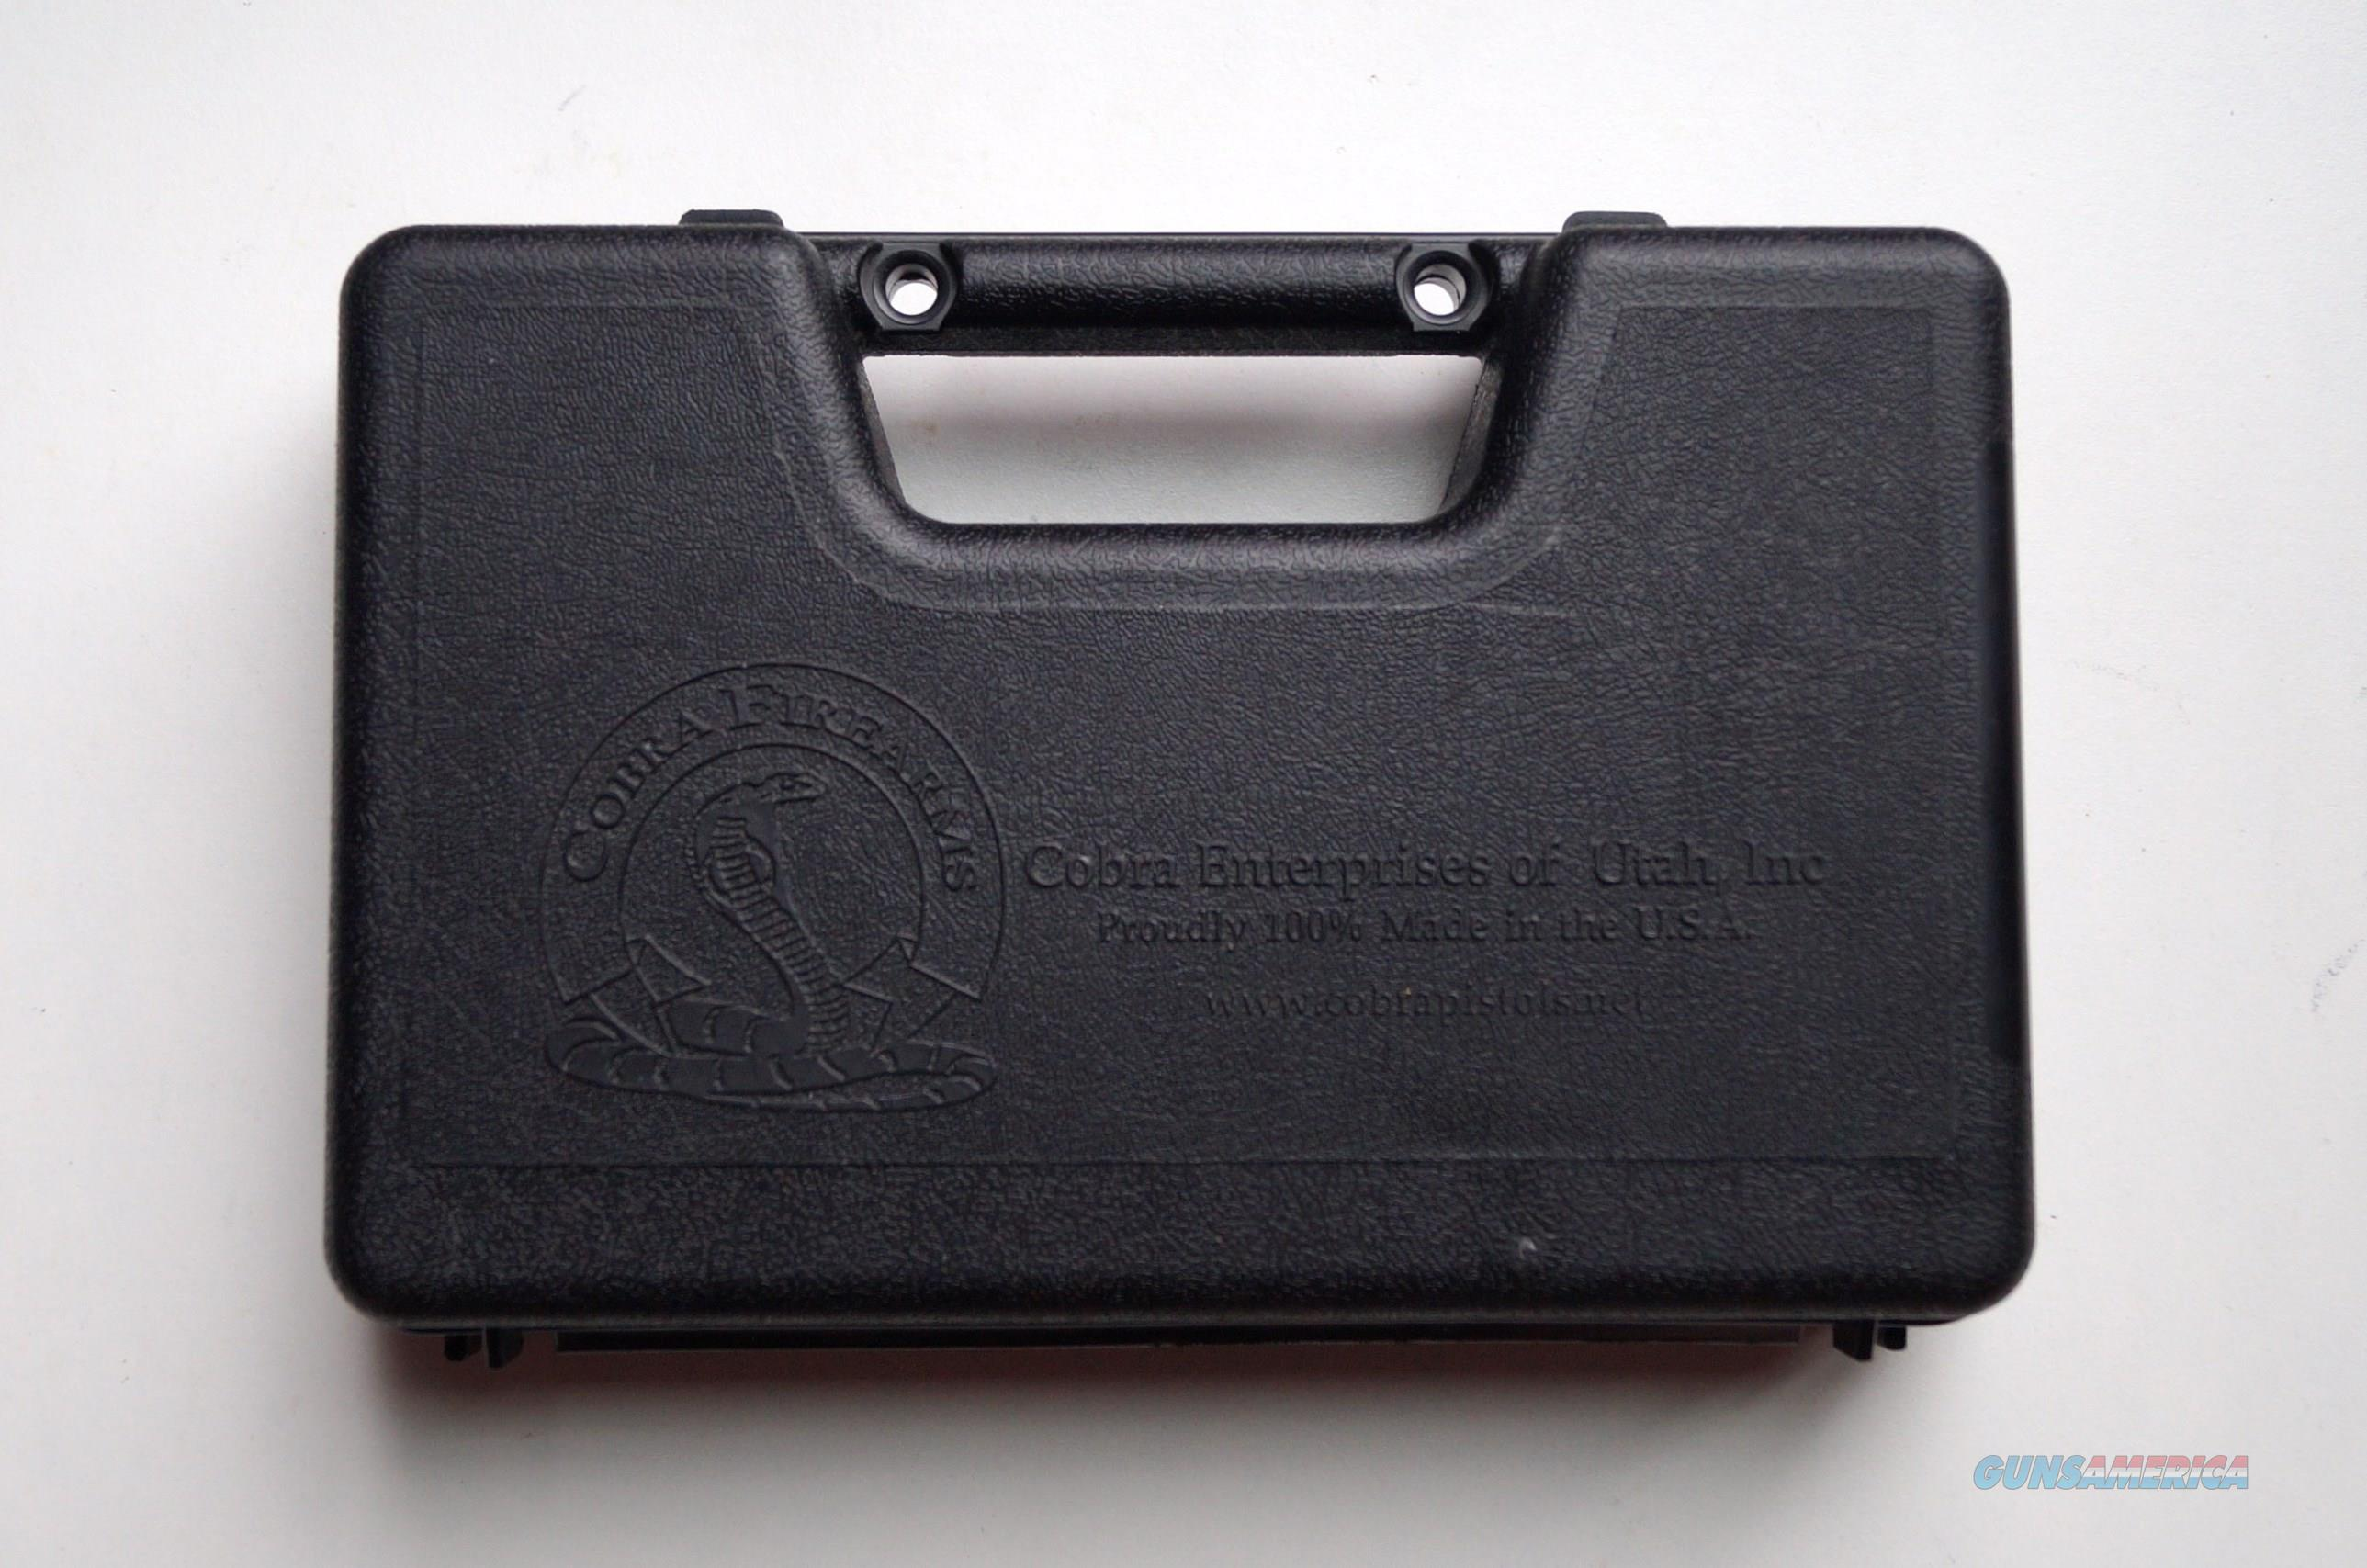 COBRA MODEL 22M (DERRINGER) WITH CASE AND ACCESSORIES - MINT CONDITON  Guns > Pistols > Cobra Derringers